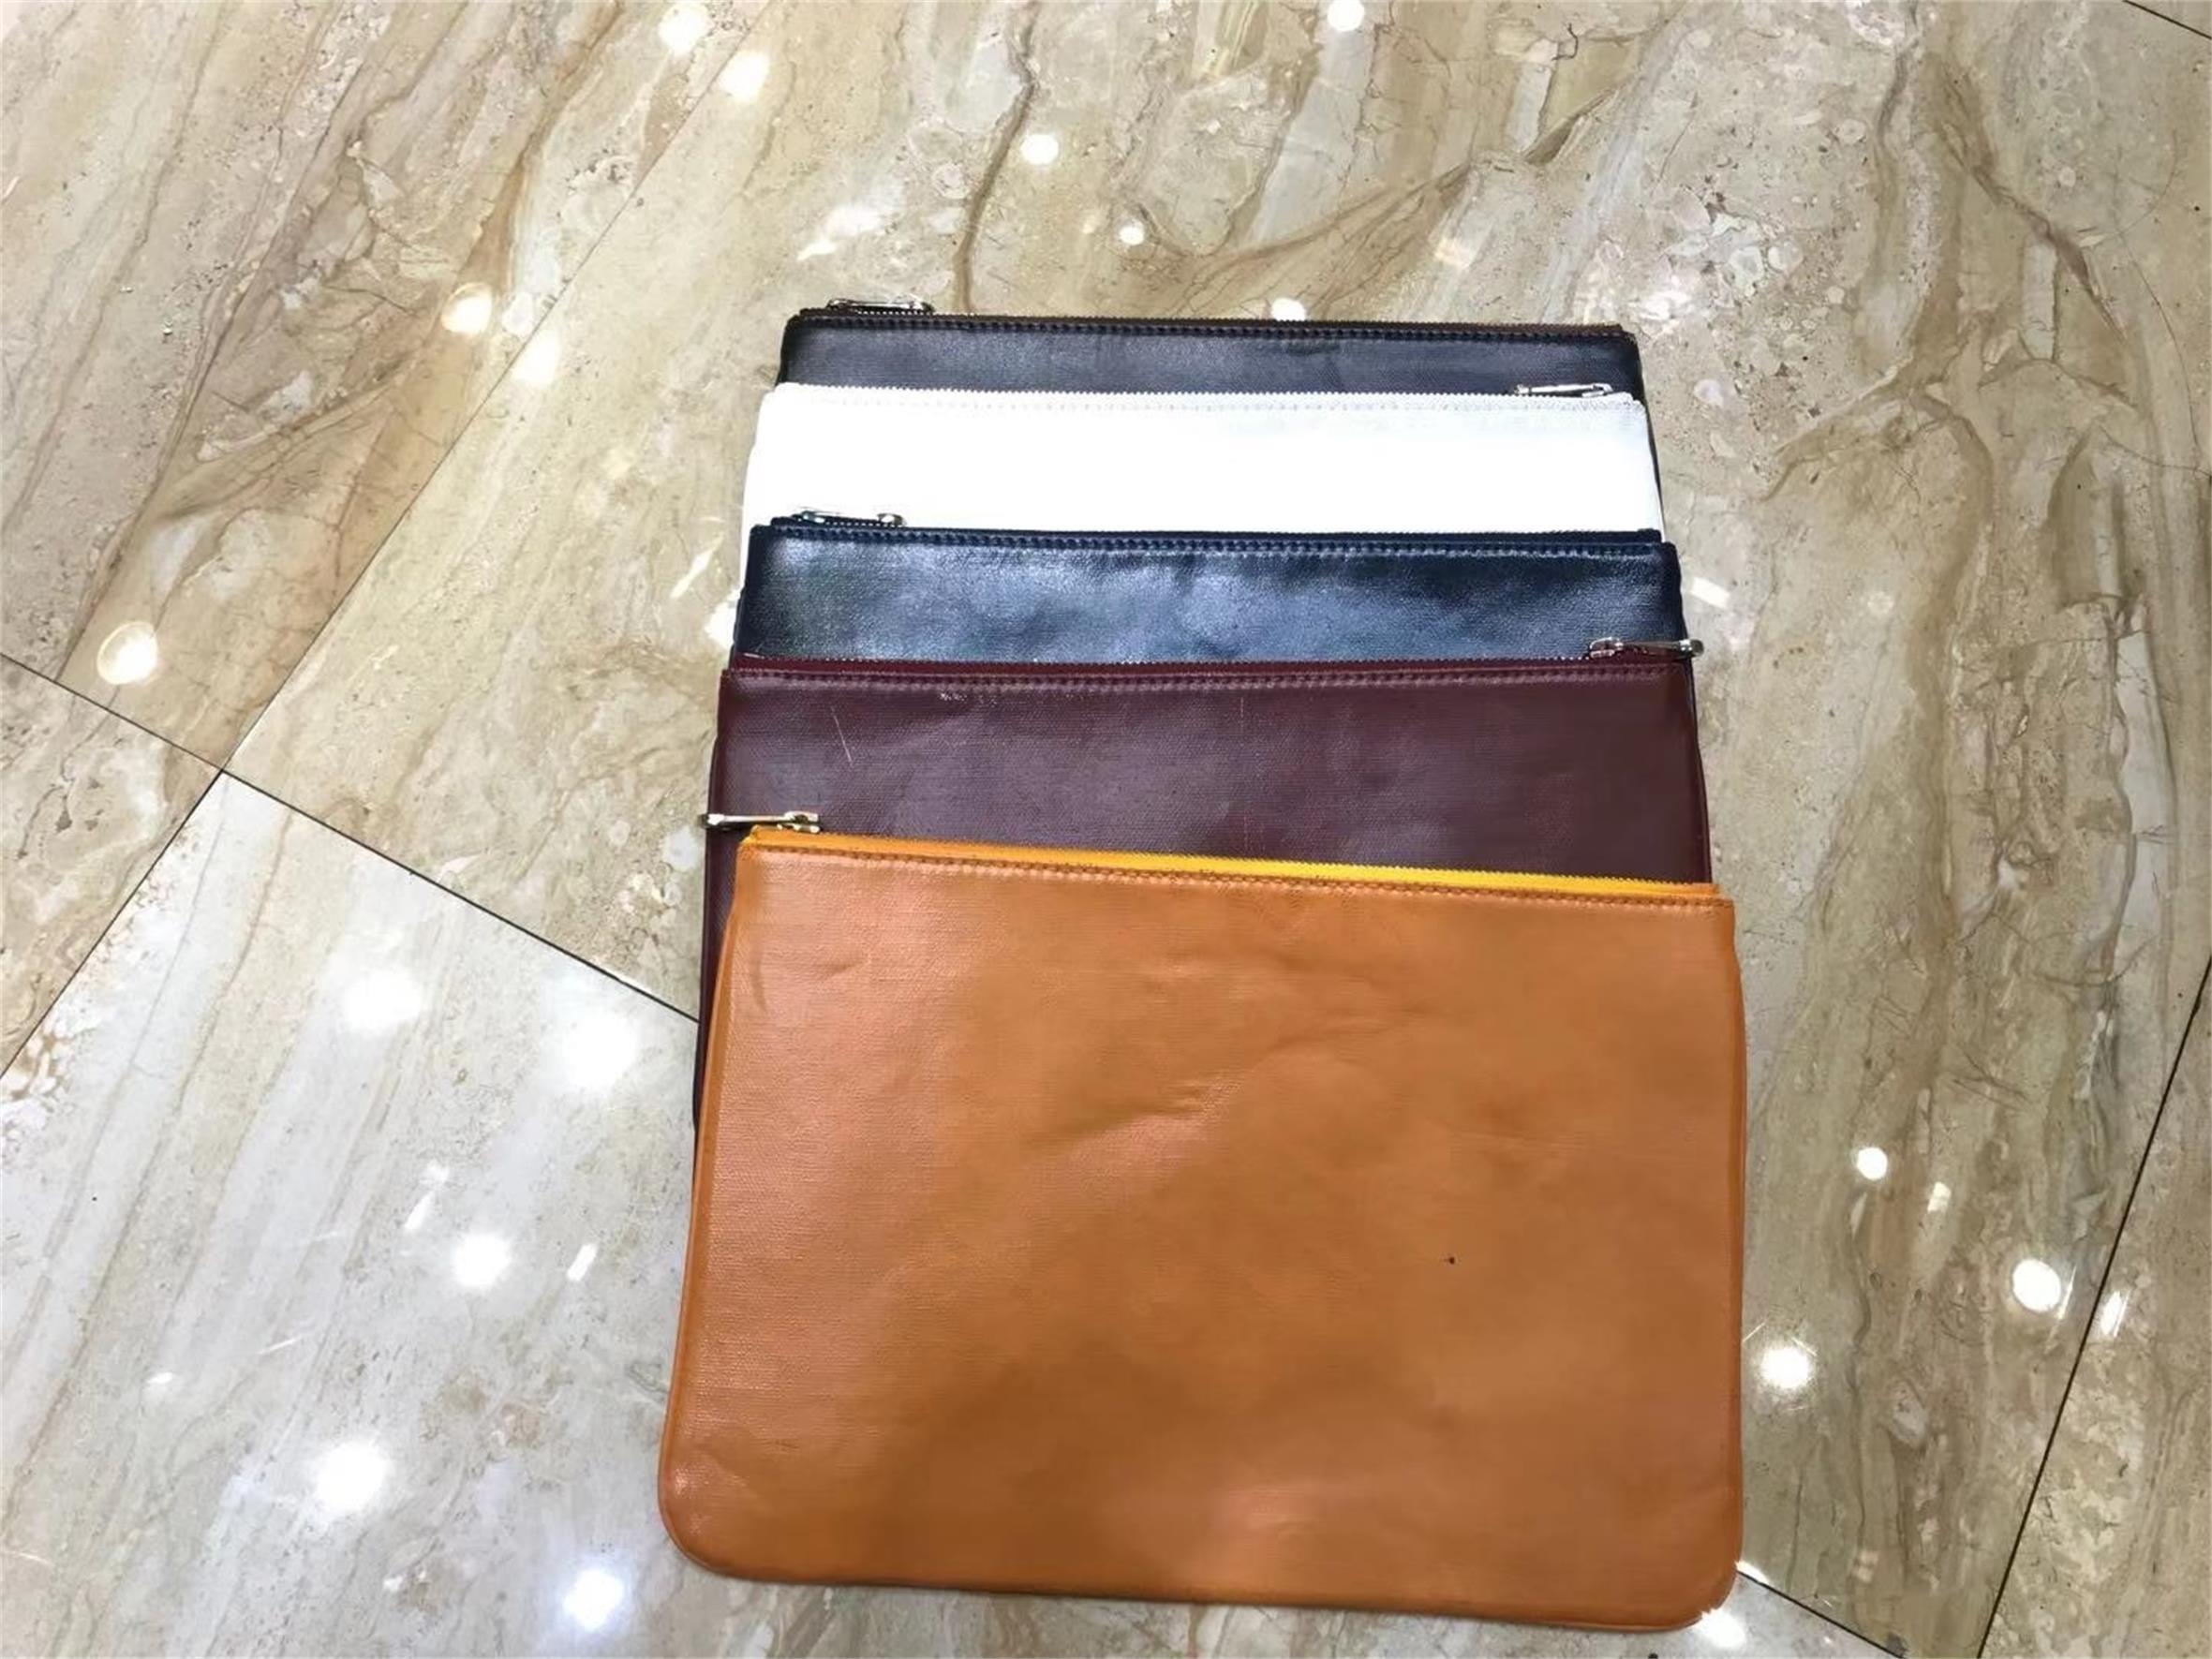 2019 high quality senior designer file bag, hand bag, leather clutch